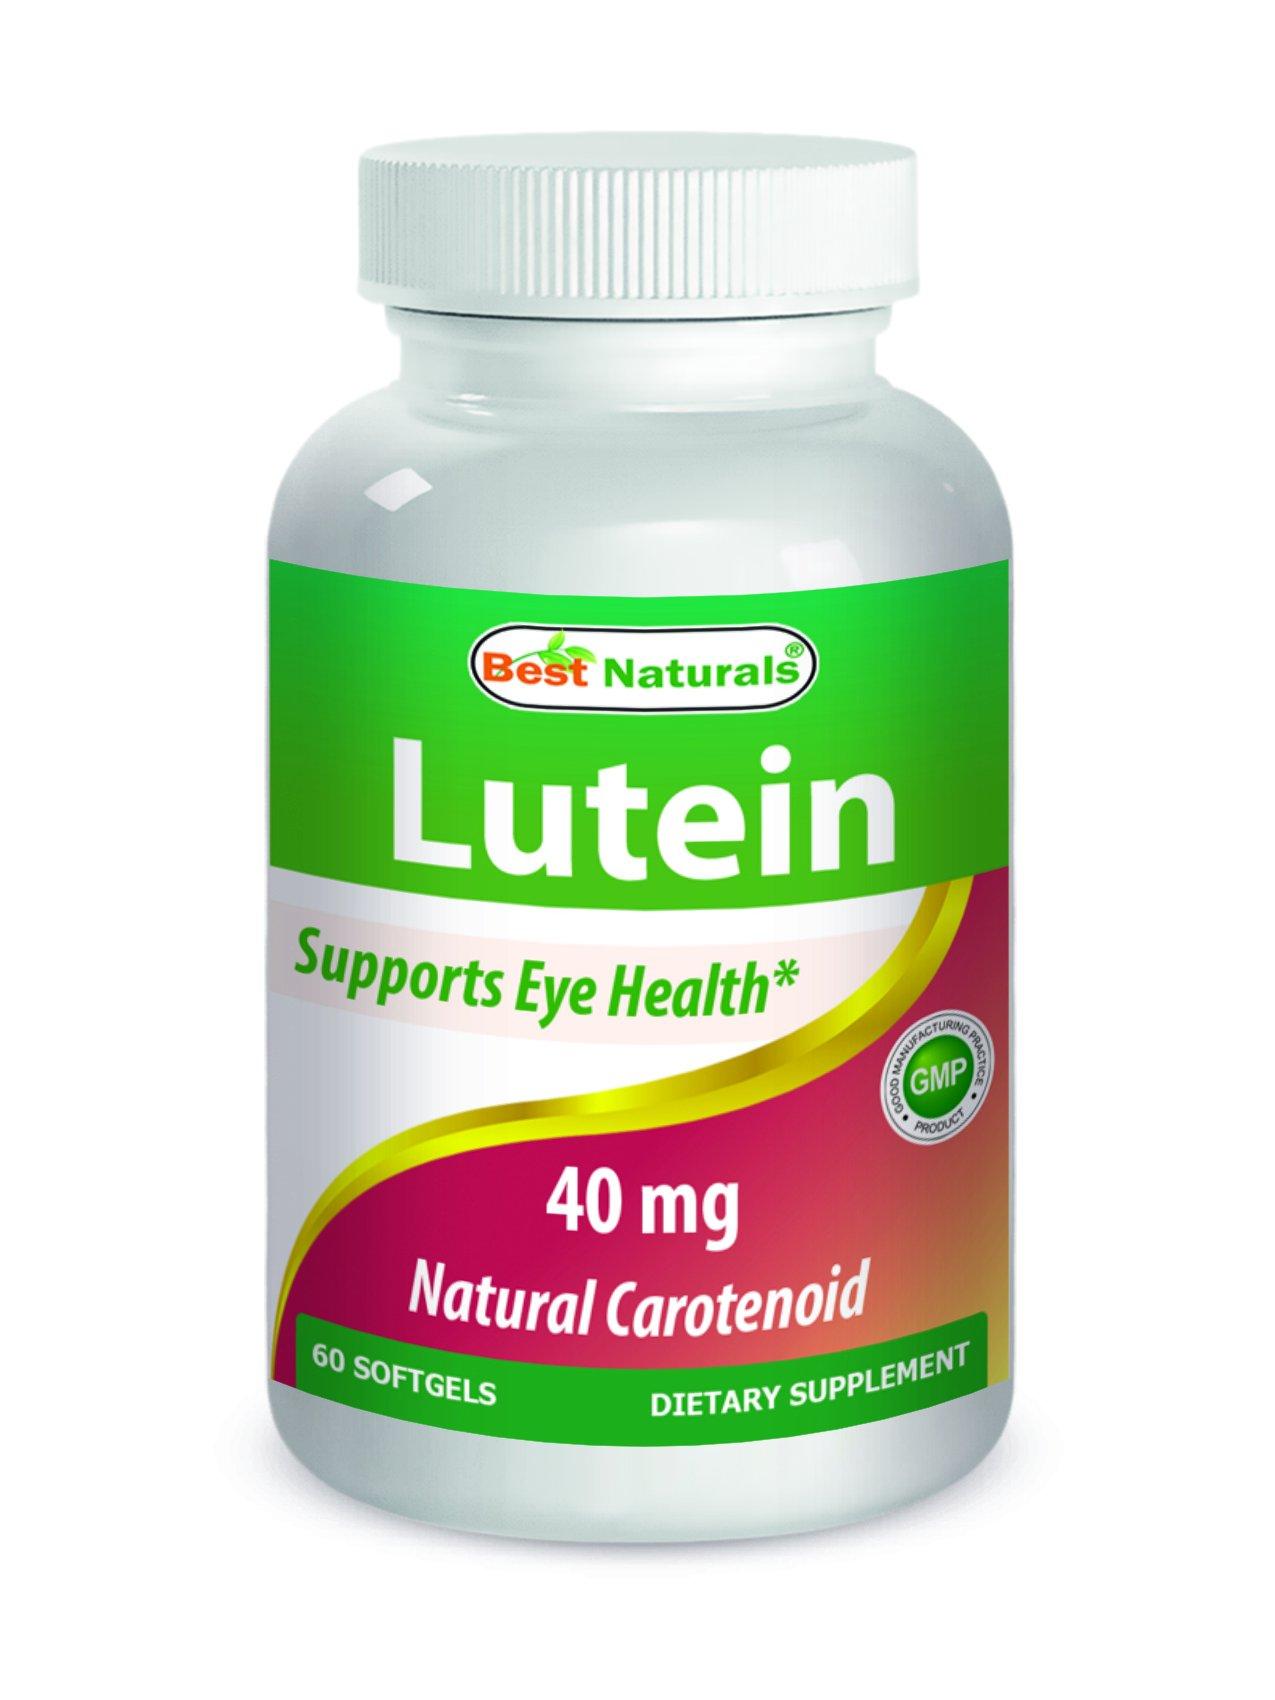 Best Naturals Lutein 40 mg 60 Softgels by Best Naturals